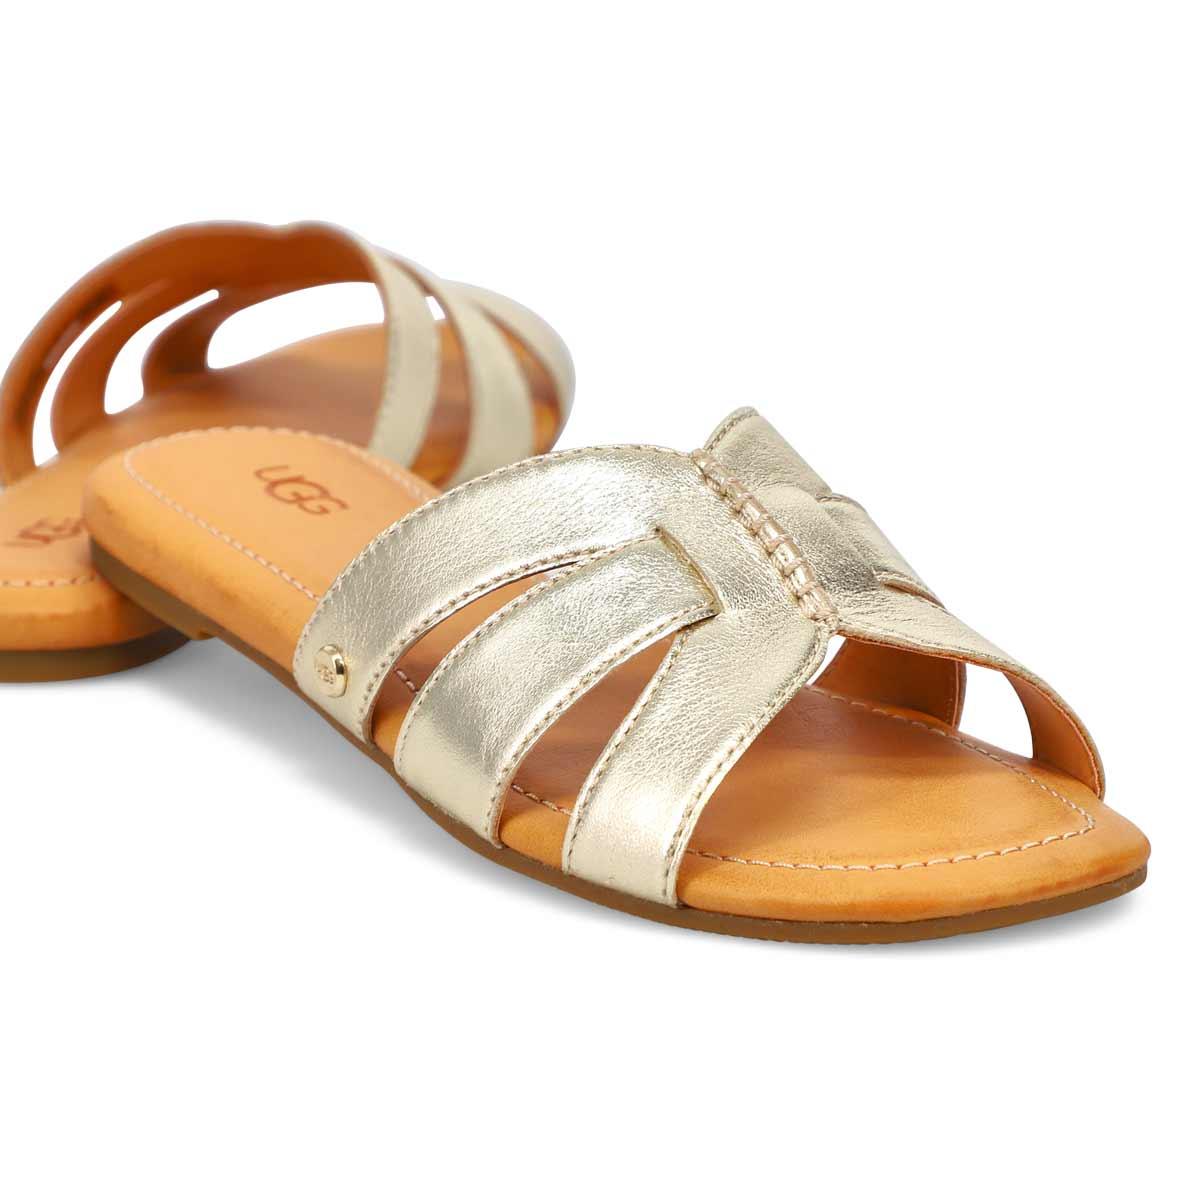 Women's Teague Slide Sandal - Metallic Gold